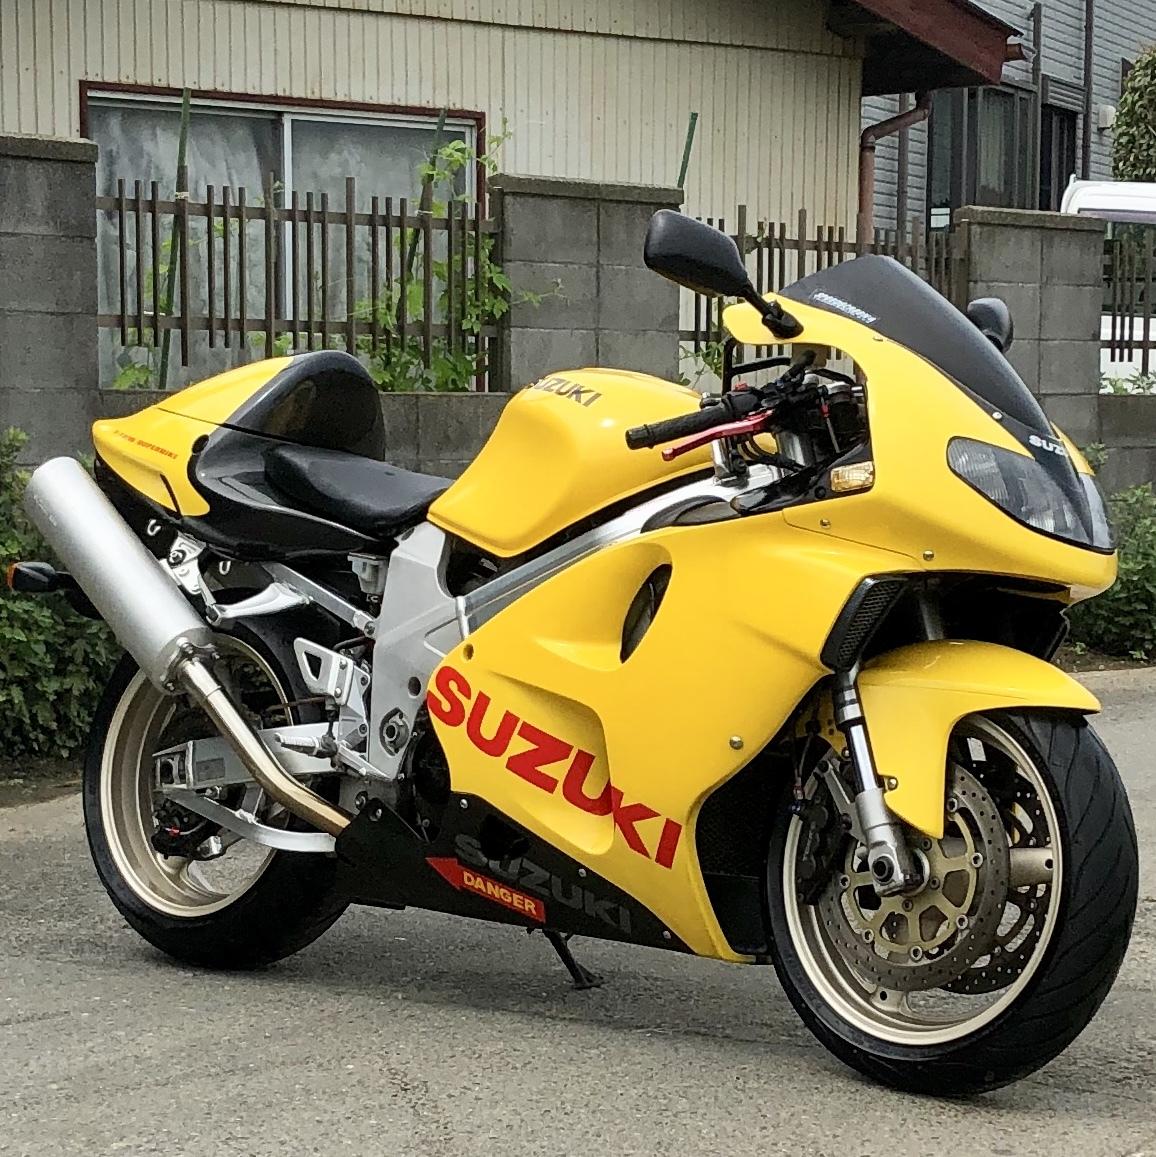 TL1000R VT52A 実動 書類付き 平成10年 大迫力 スズキ 検) TL GSX GT GS FX Z1 XS XJ CB CBR ZX FZ YZF ZZR SS GSF X11 ハヤブサ ゼファー